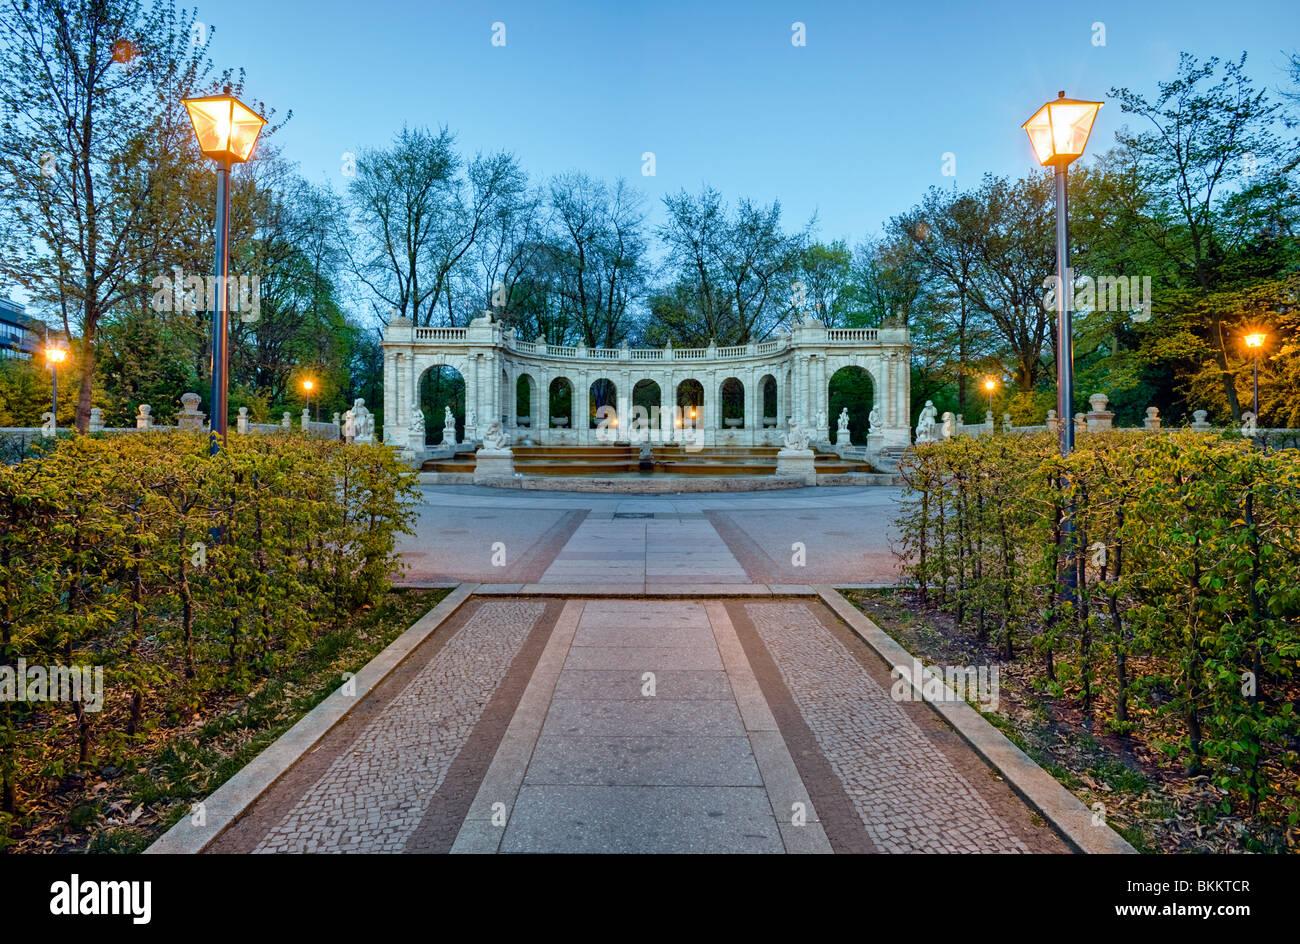 Fountain of fairy tales, Volkspark Friedrichshain, Berlin, Germany - Stock Image